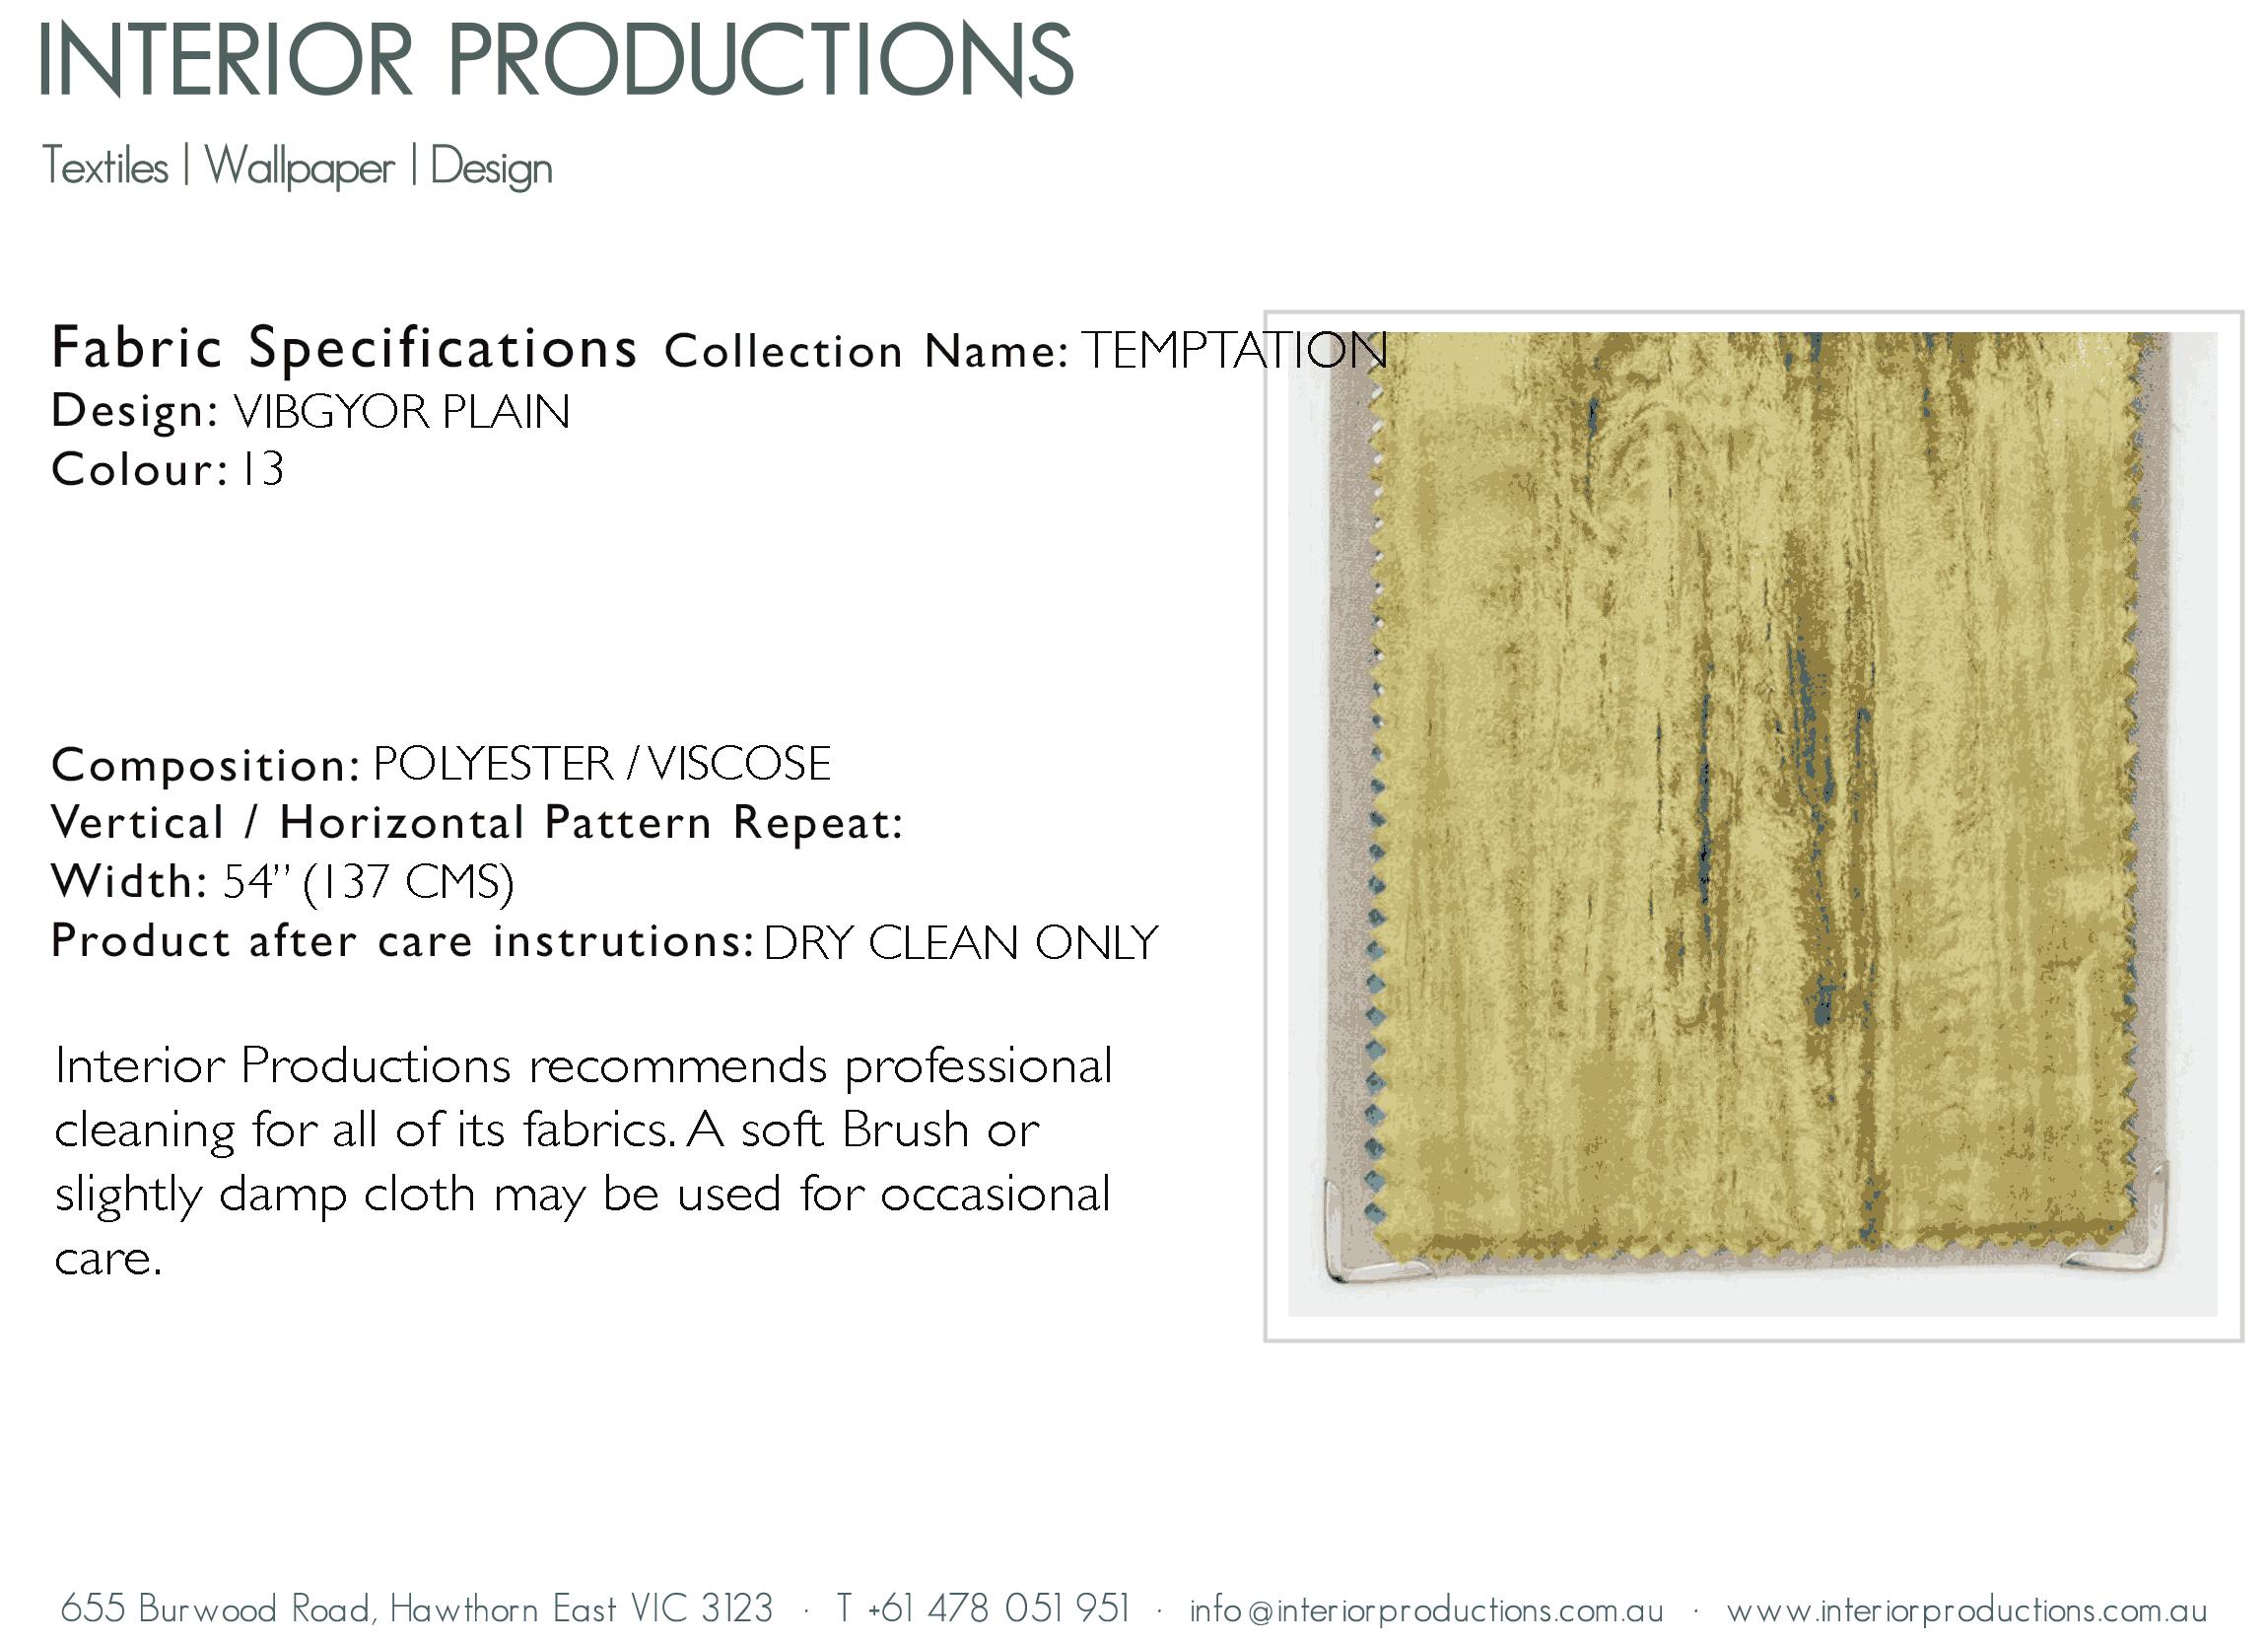 interior_productions_VIBGYOR-PLAIN---13